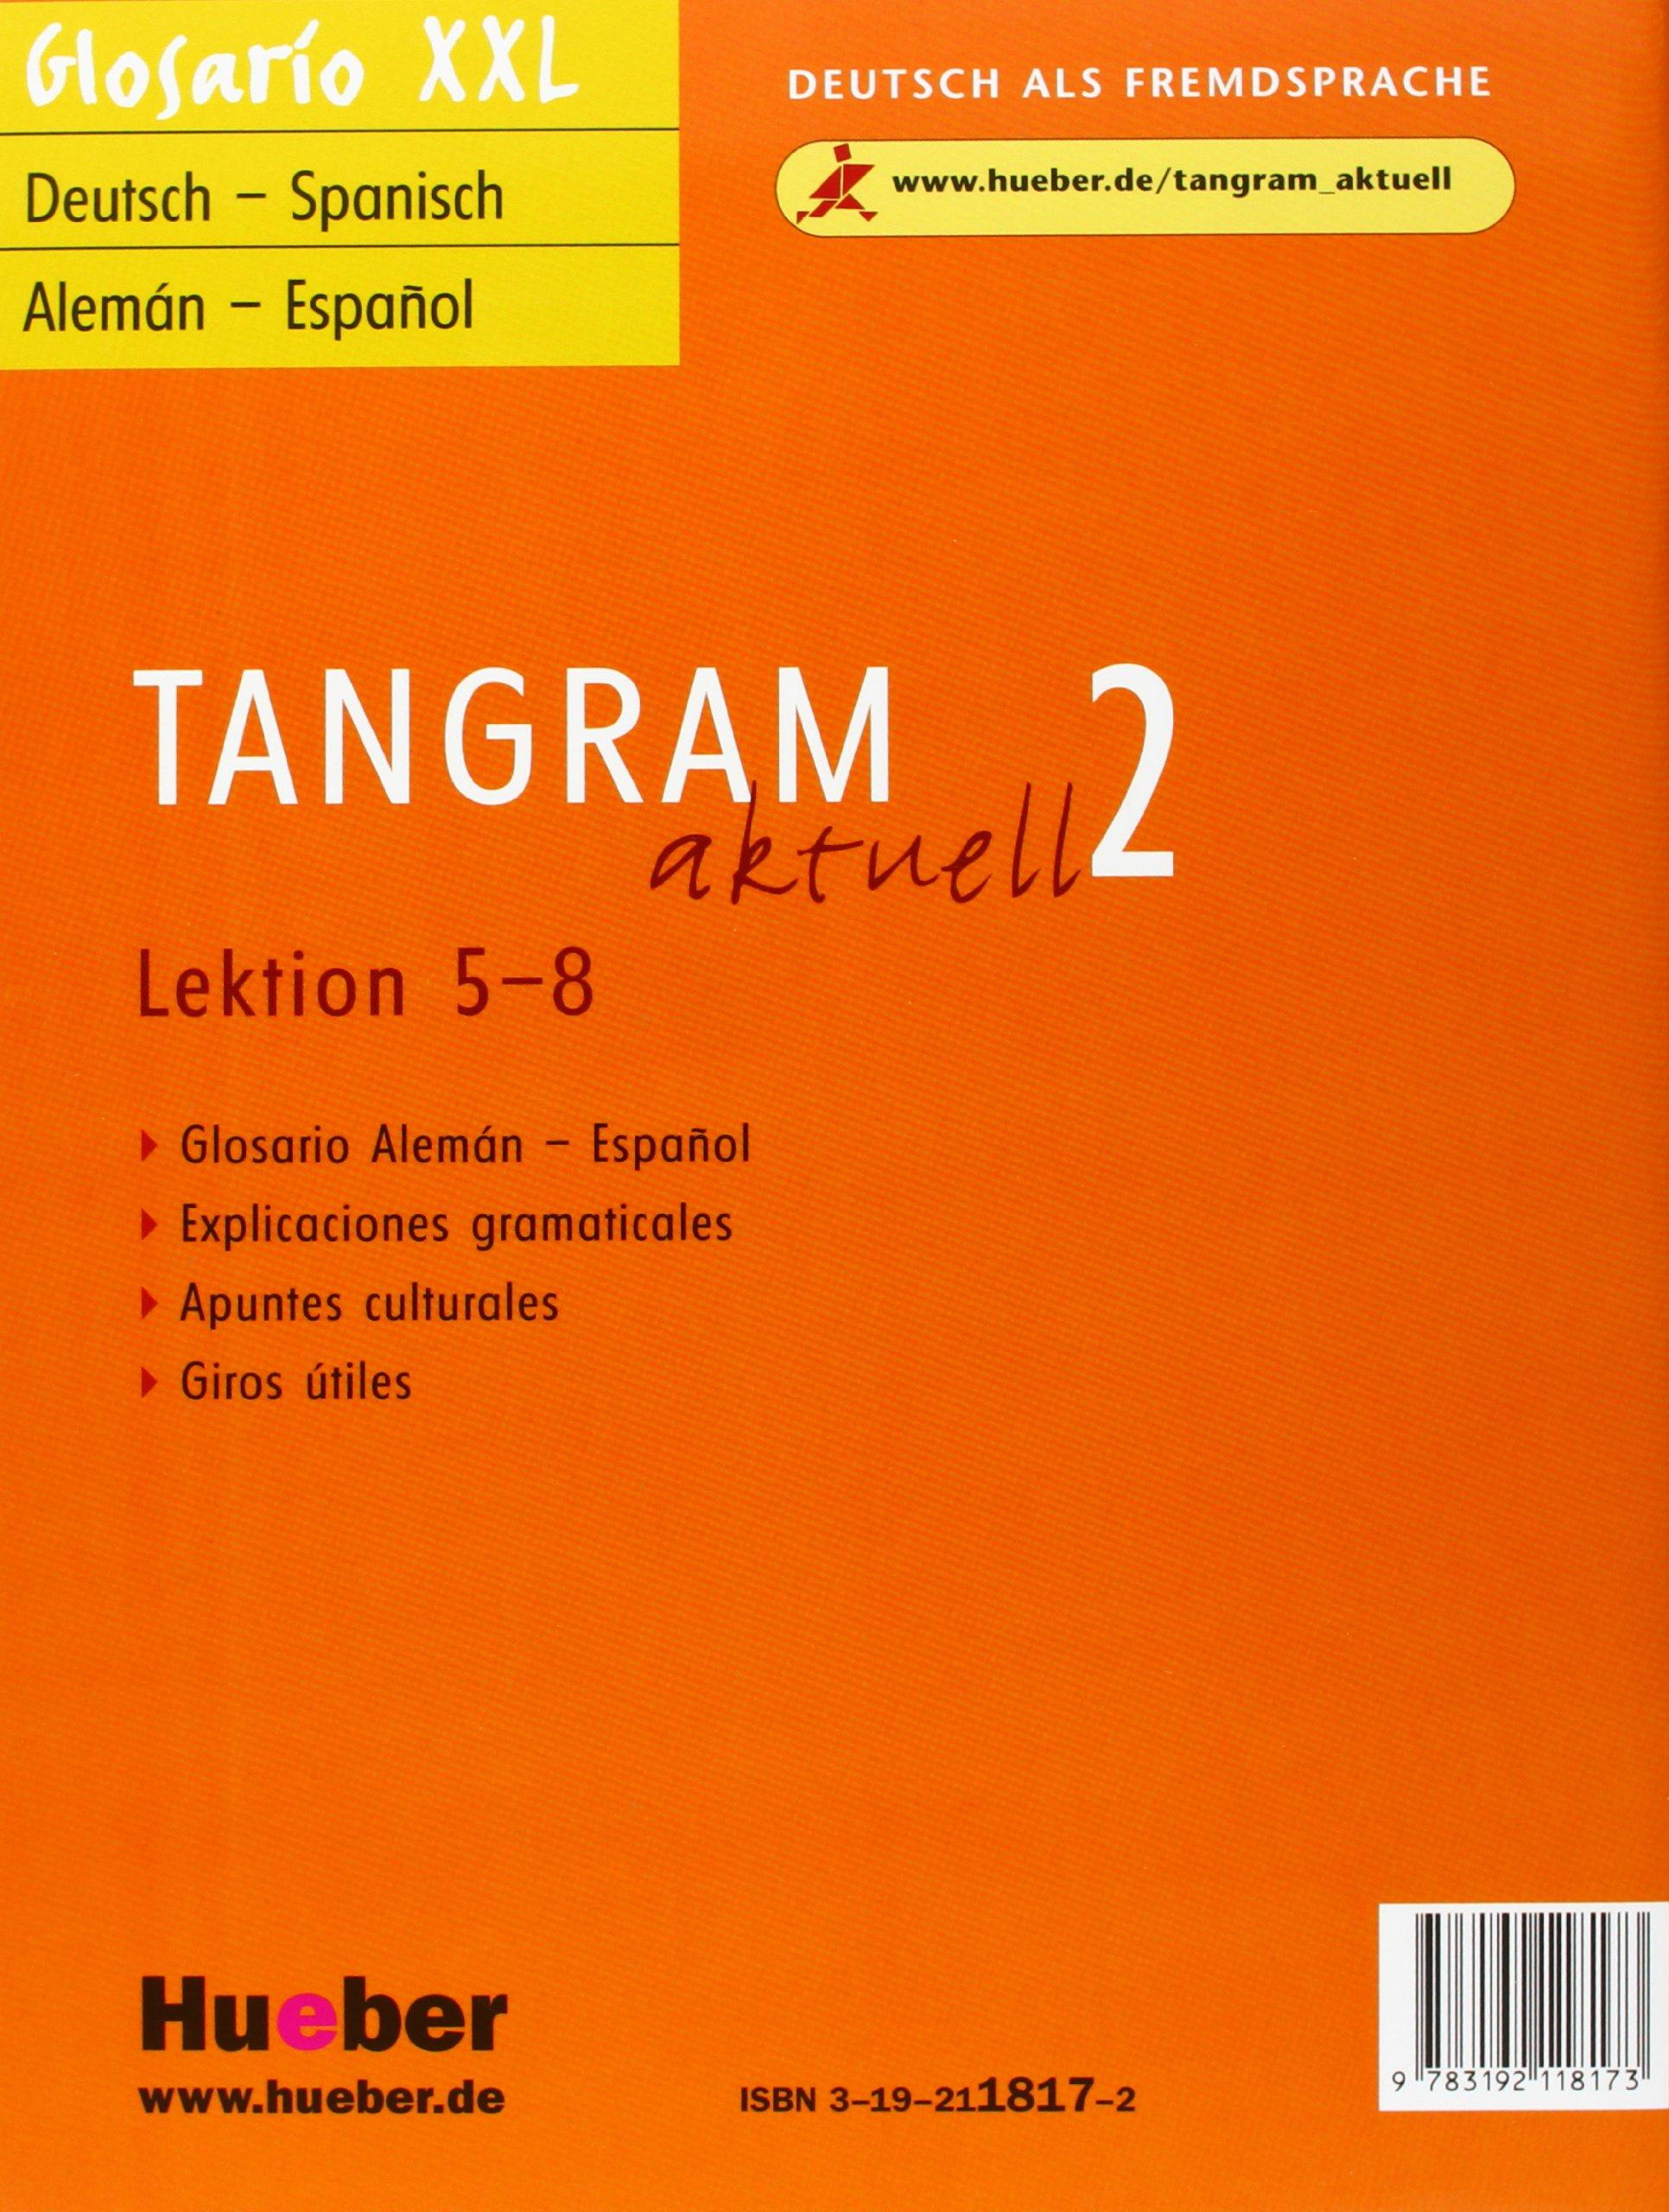 tangram aktuell 1 lektion 5-8 скачать